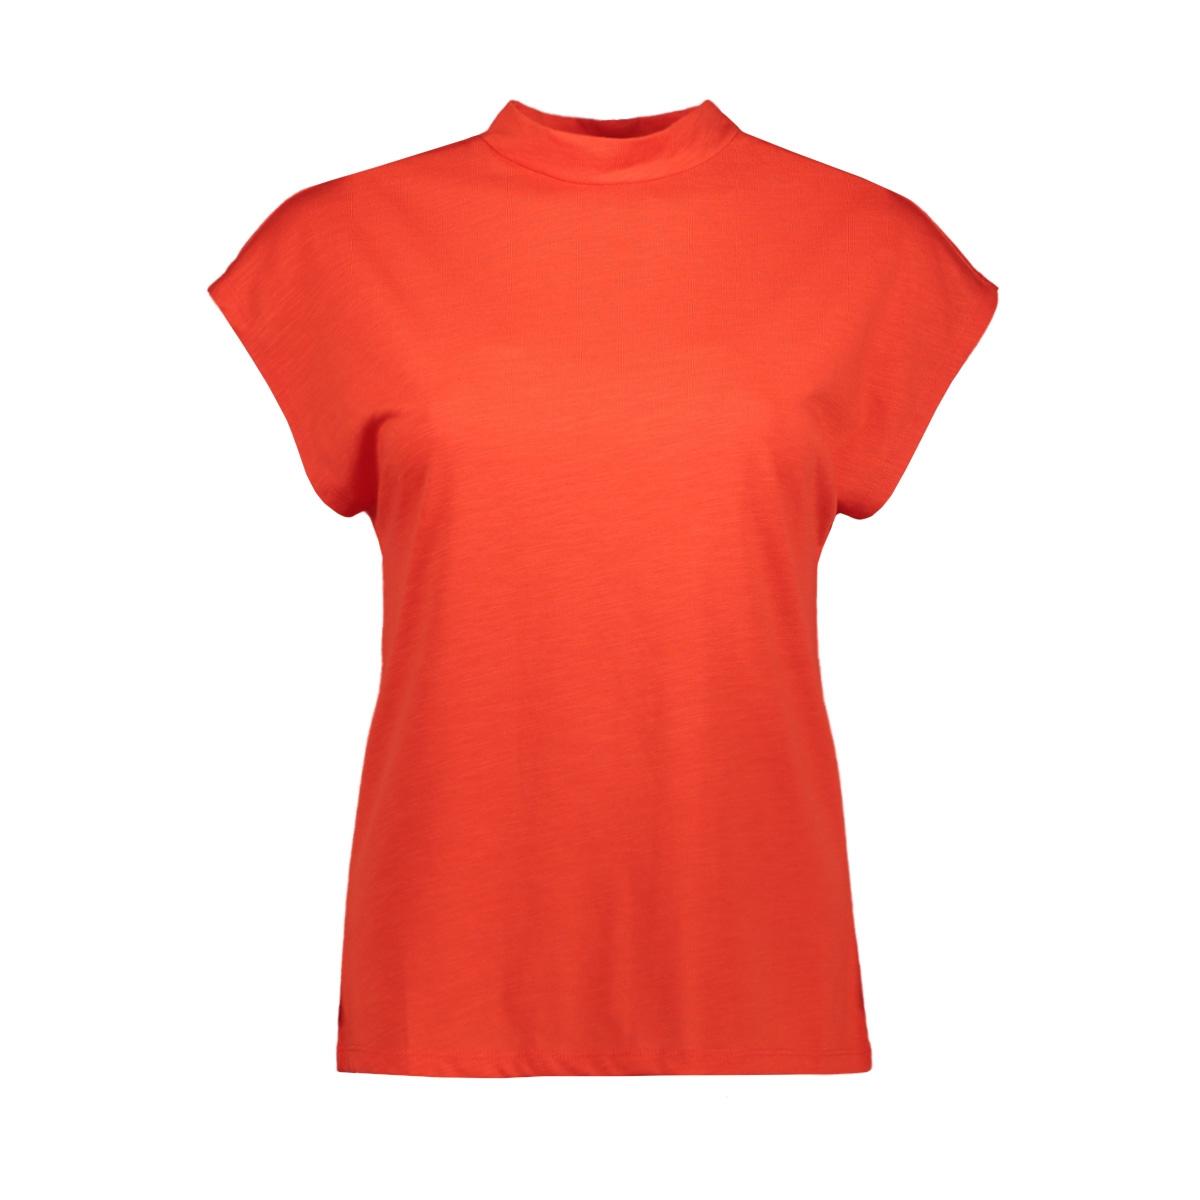 nmdenny s/s  high neck top 27011782 noisy may t-shirt fiery red